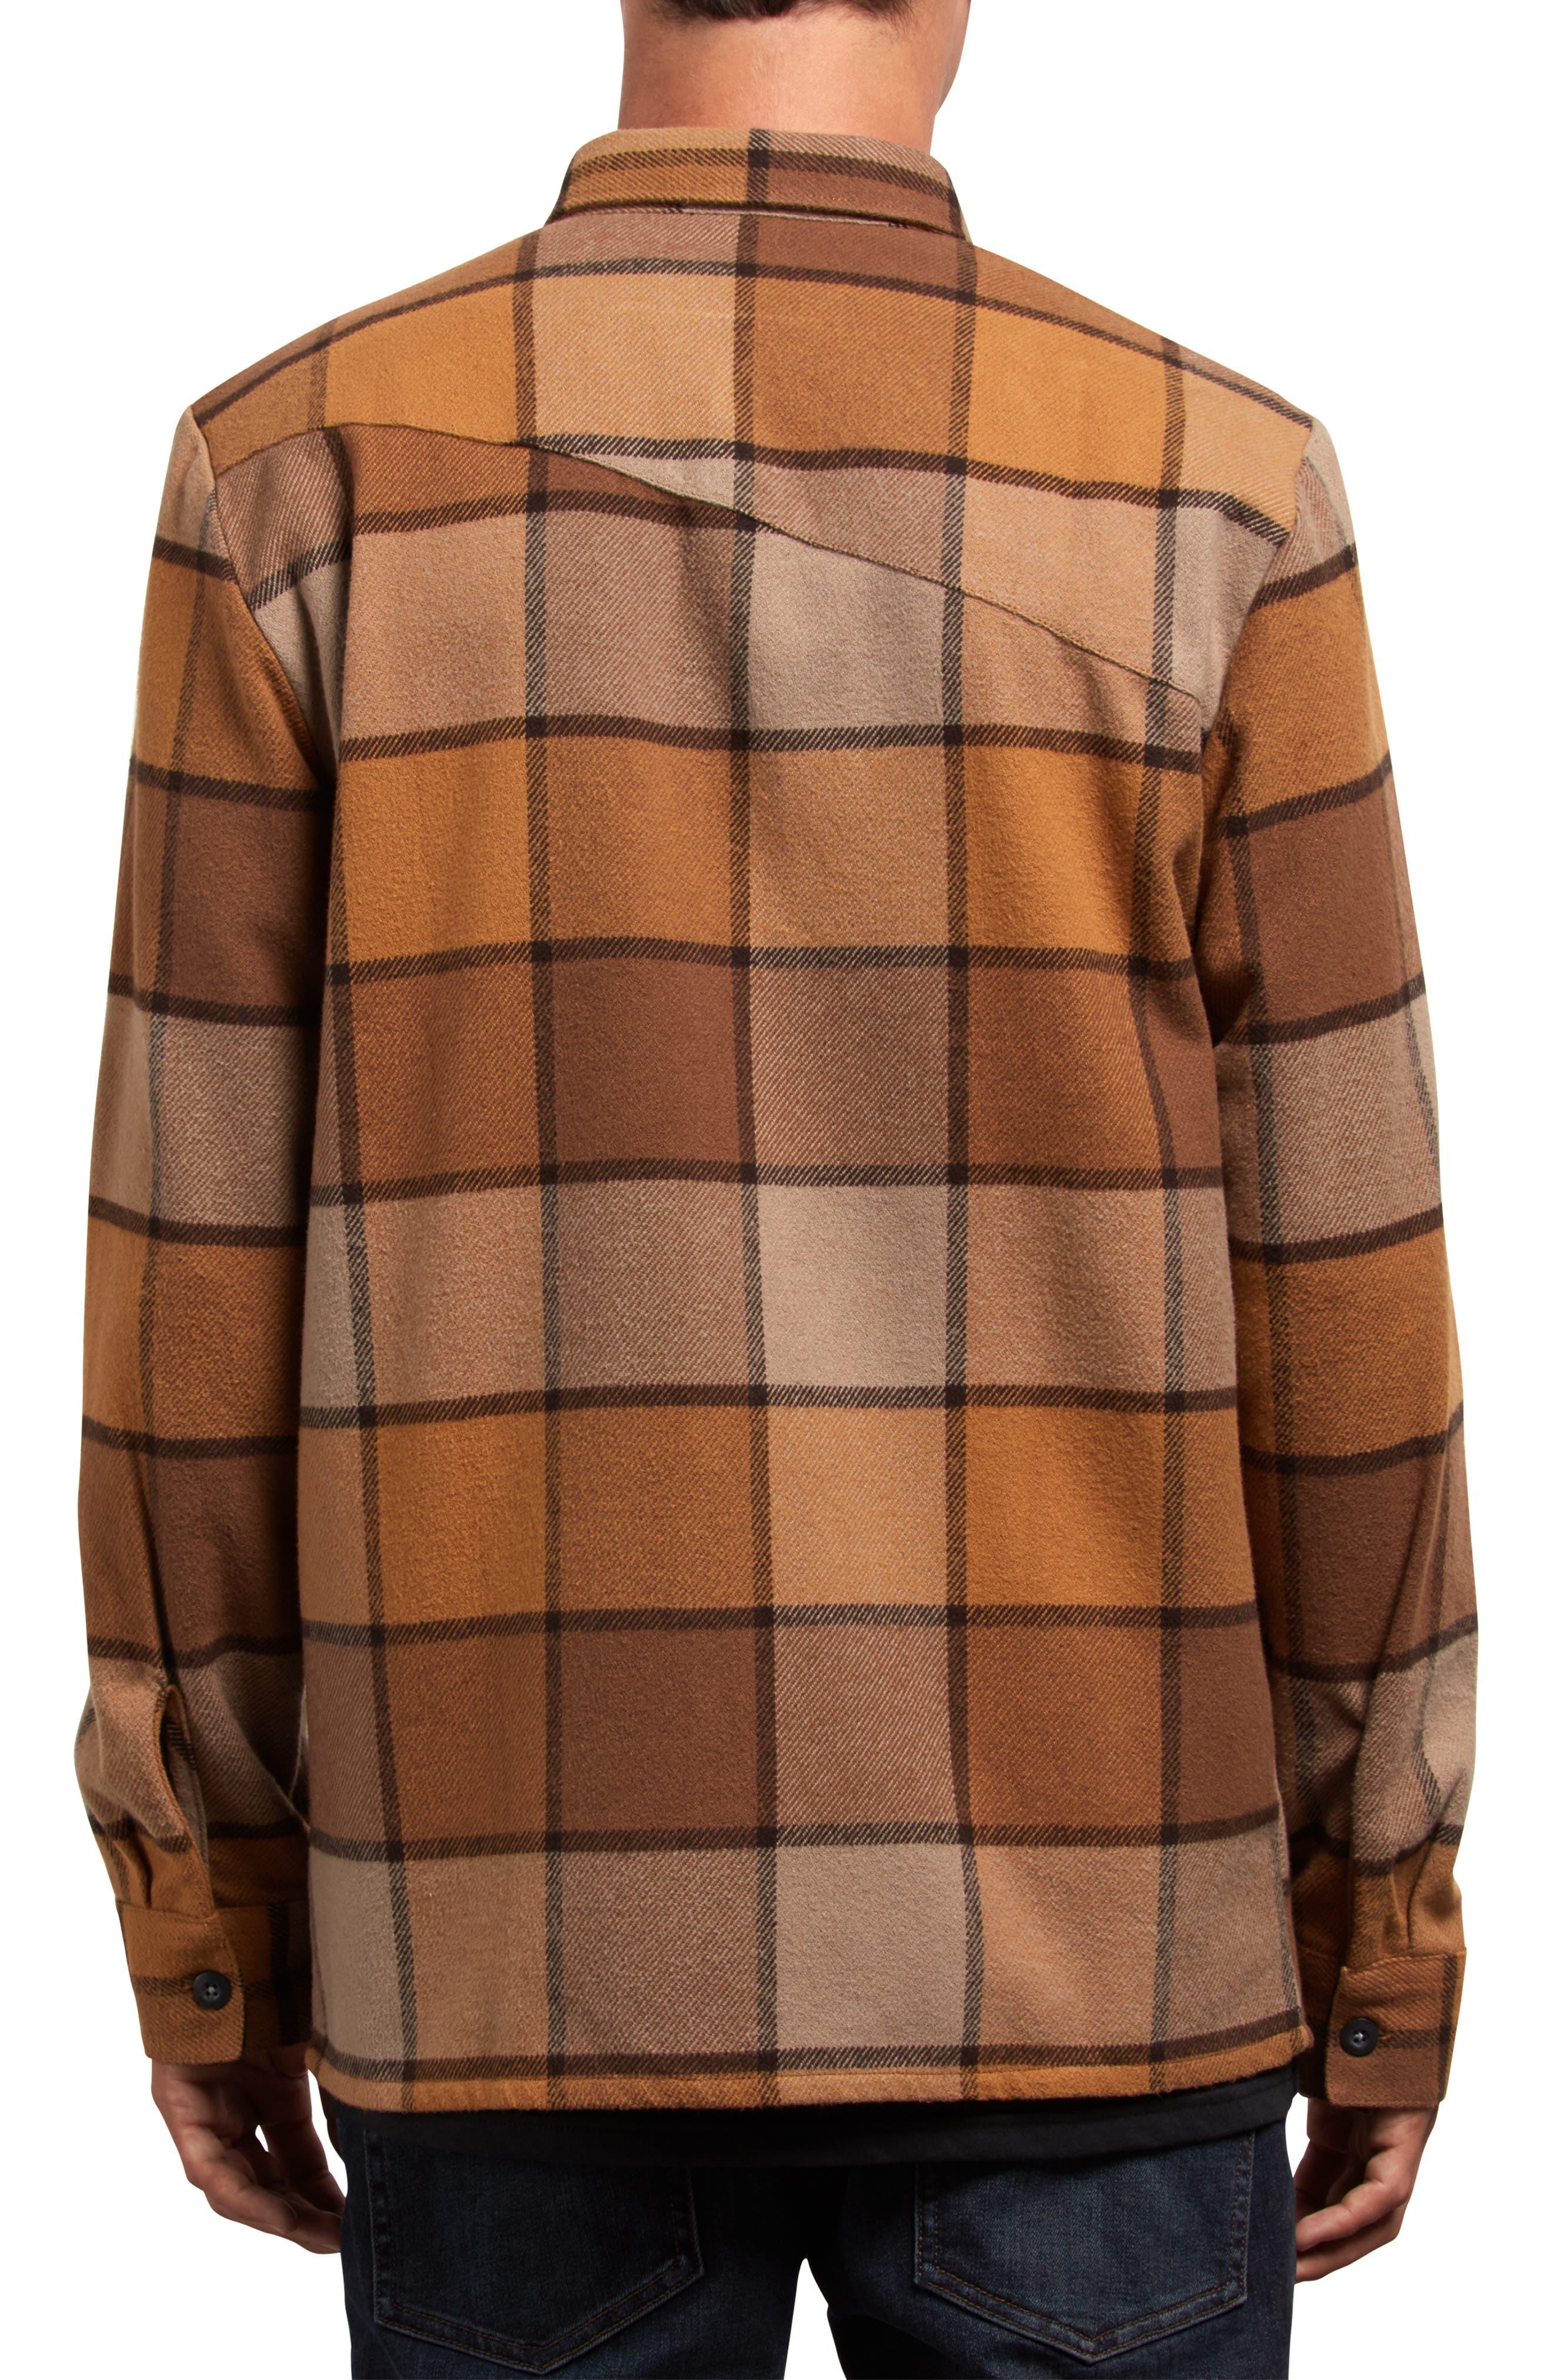 Randower Plaid Flannel Shirt,                             Alternate thumbnail 2, color,                             MUD